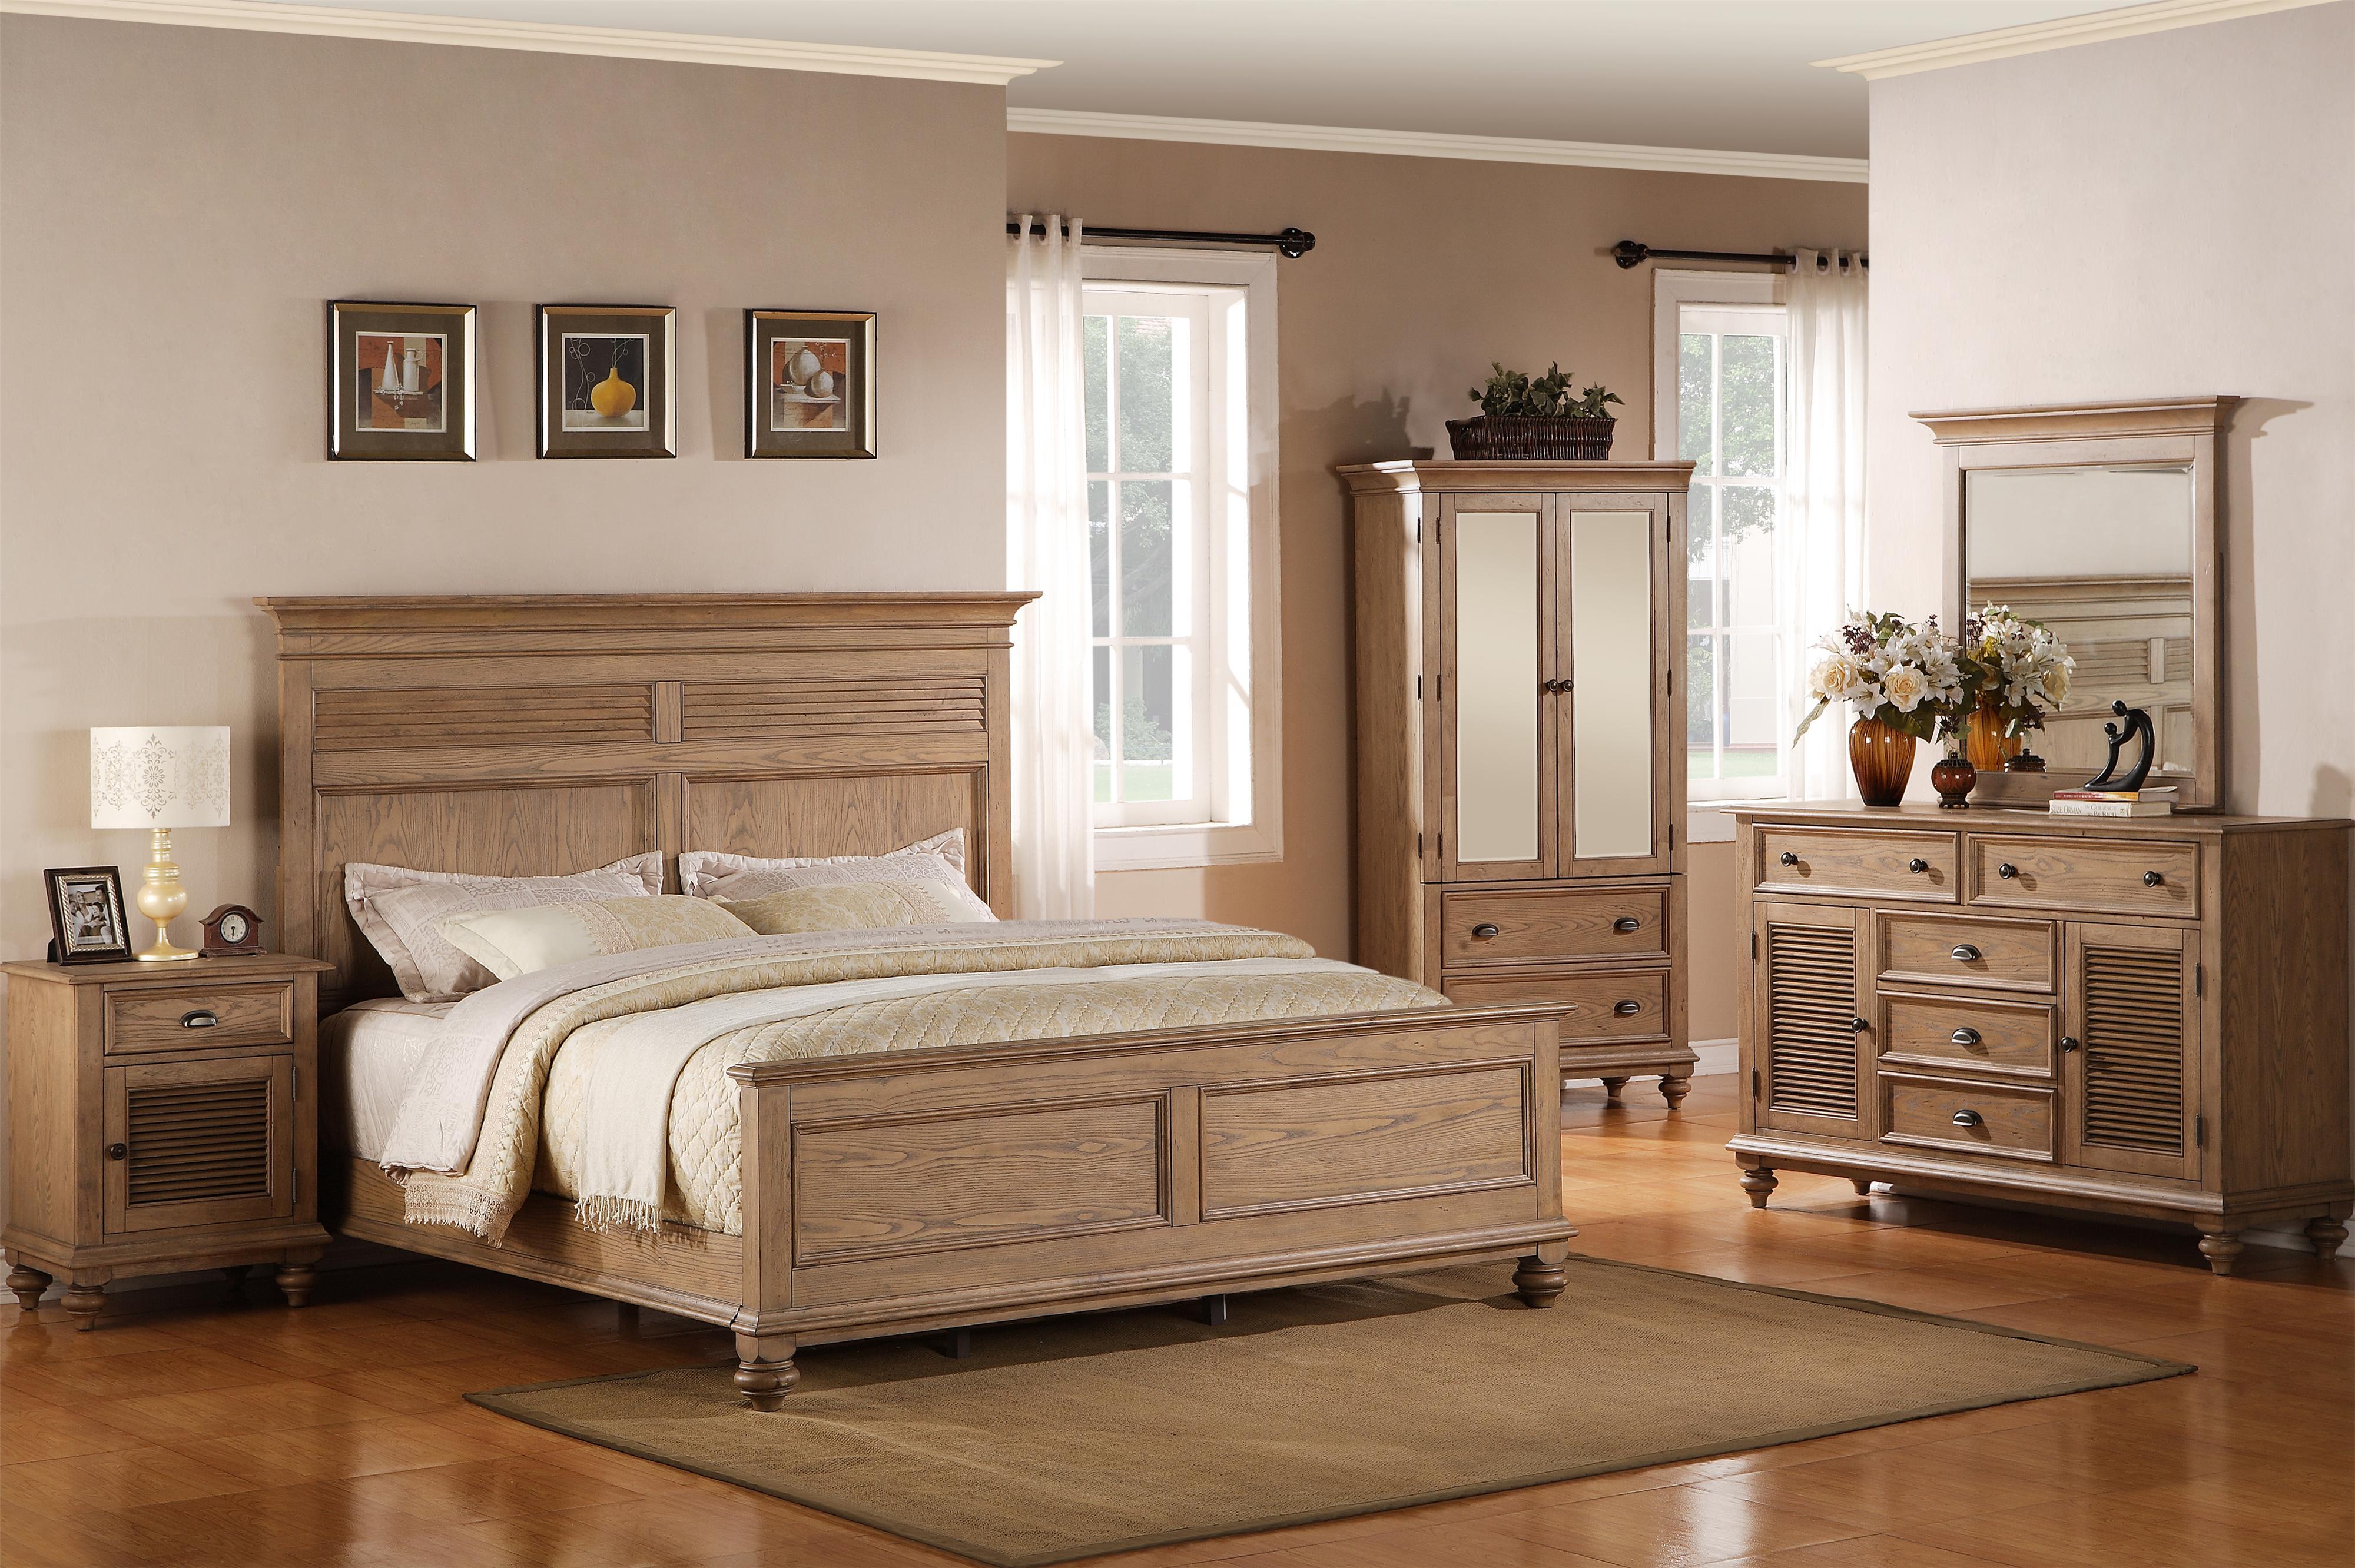 Riverside Furniture Coventry King Bedroom Group Value City Furniture Bedroom Group